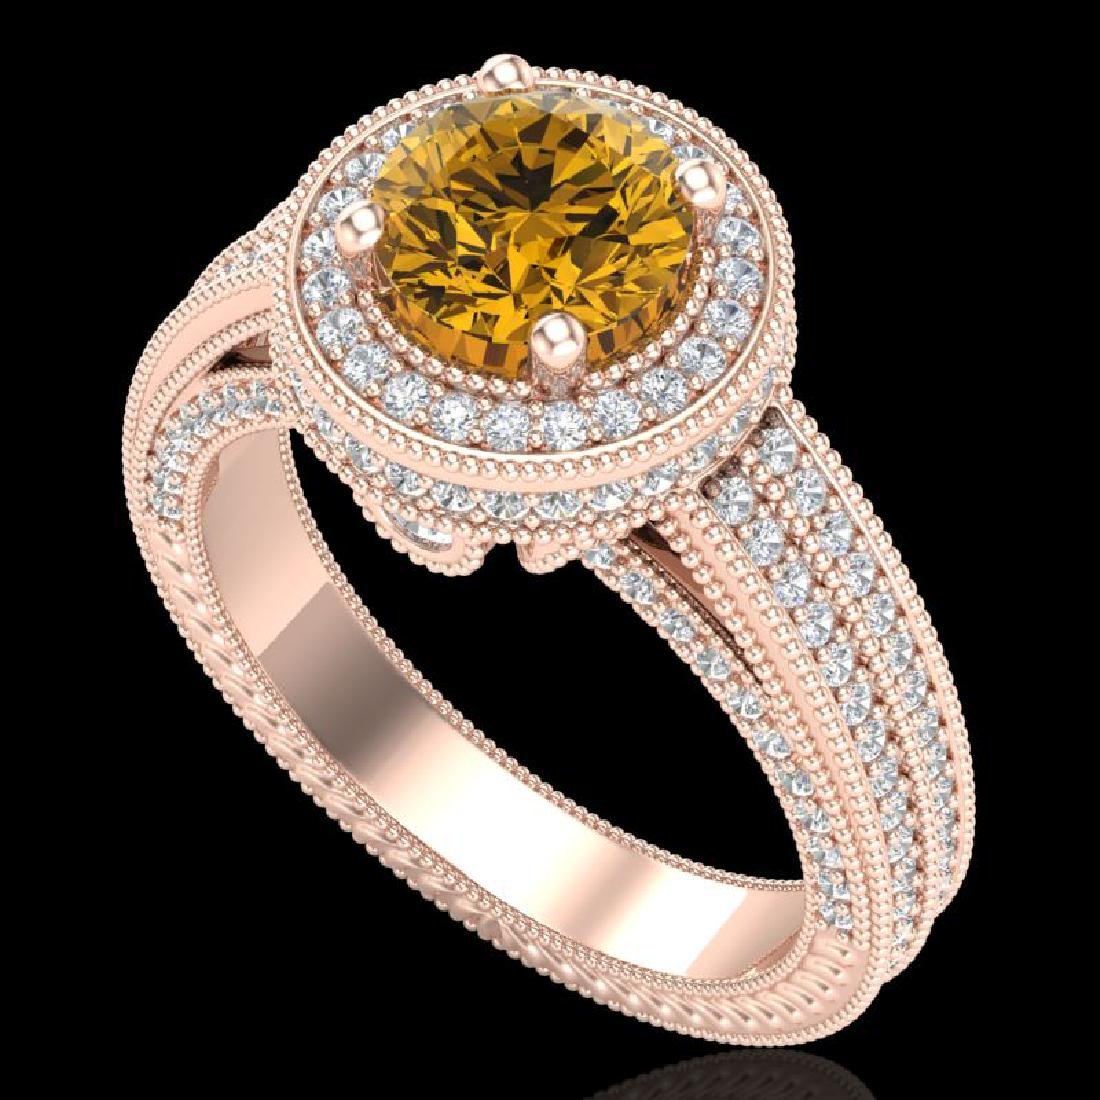 2.8 CTW Intense Fancy Yellow Diamond Engagement Art